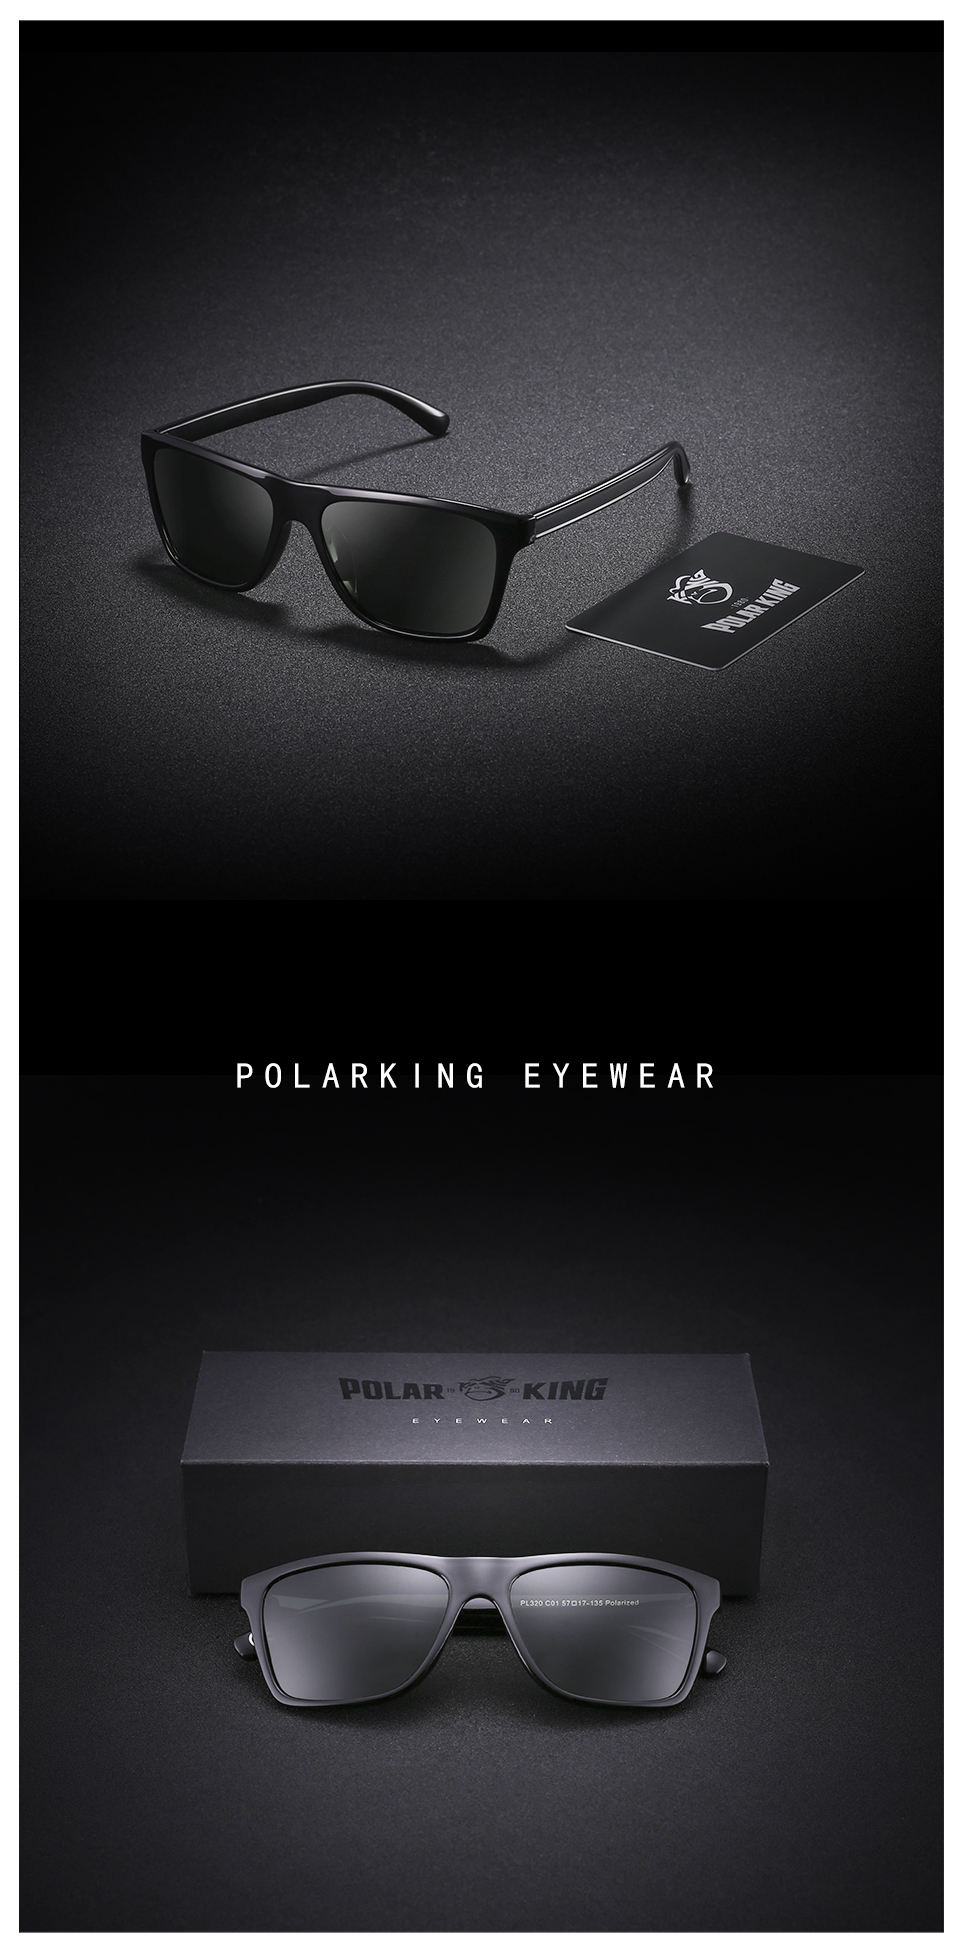 62b17751e8 POLARKING Brand Retro Plastic Sun Glasses For Men Travel Oculos de ...